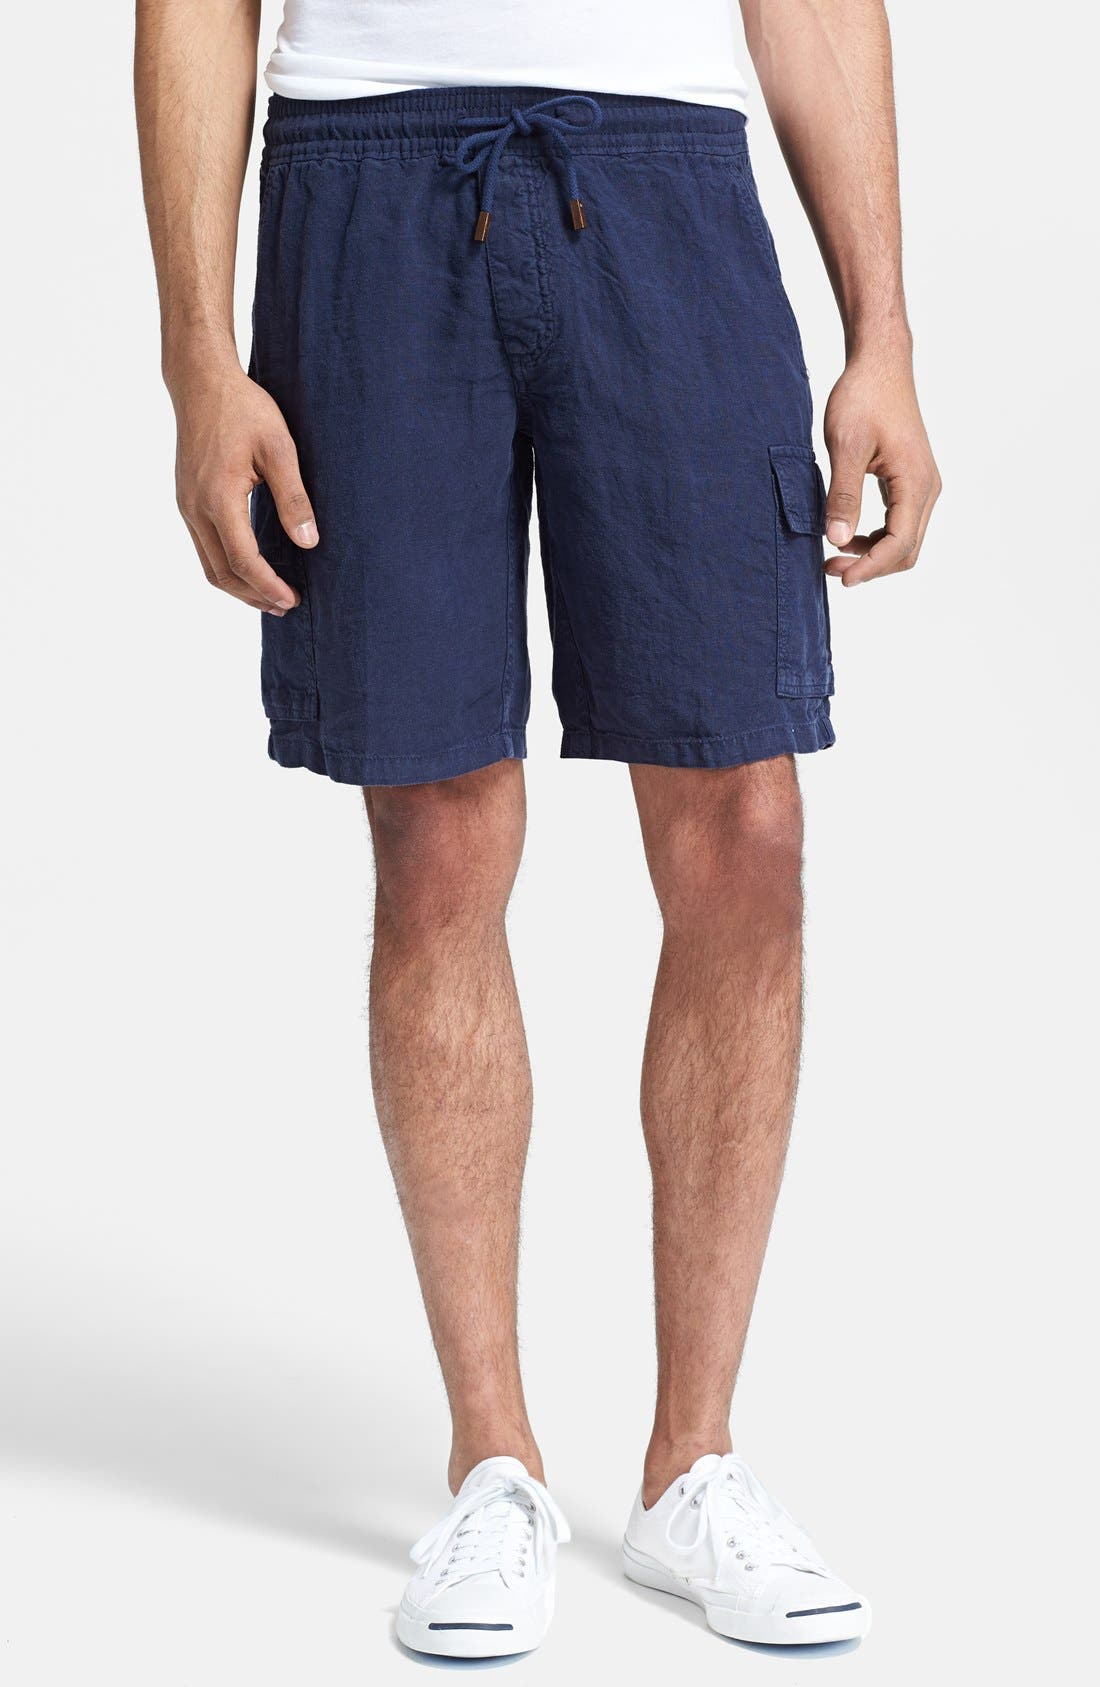 Alternate Image 1 Selected - Vilebrequin 'Baie' Linen Cargo Shorts